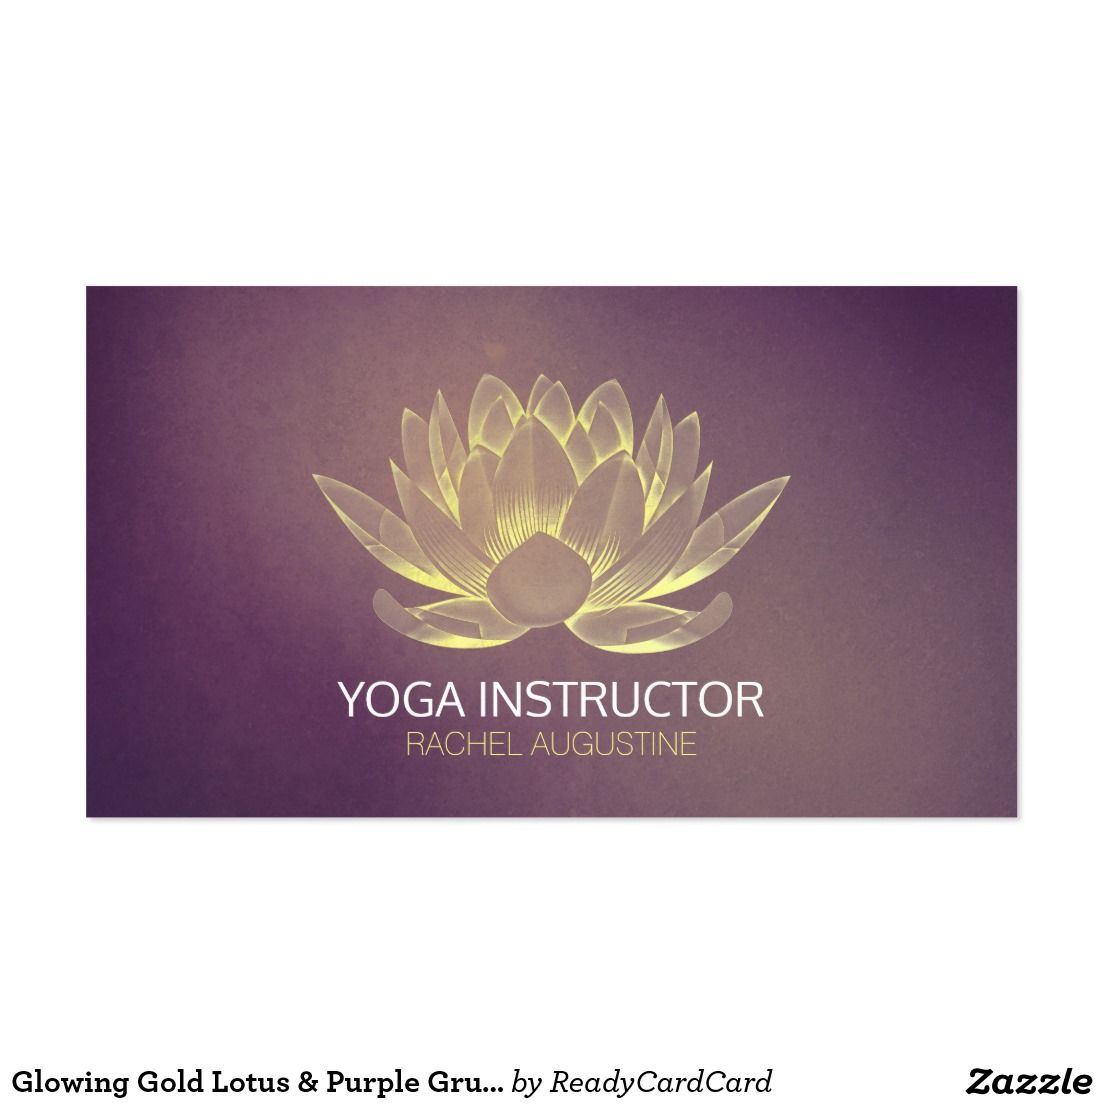 Glowing Gold Lotus & Purple Grunge Yoga Instructor Business Card ...